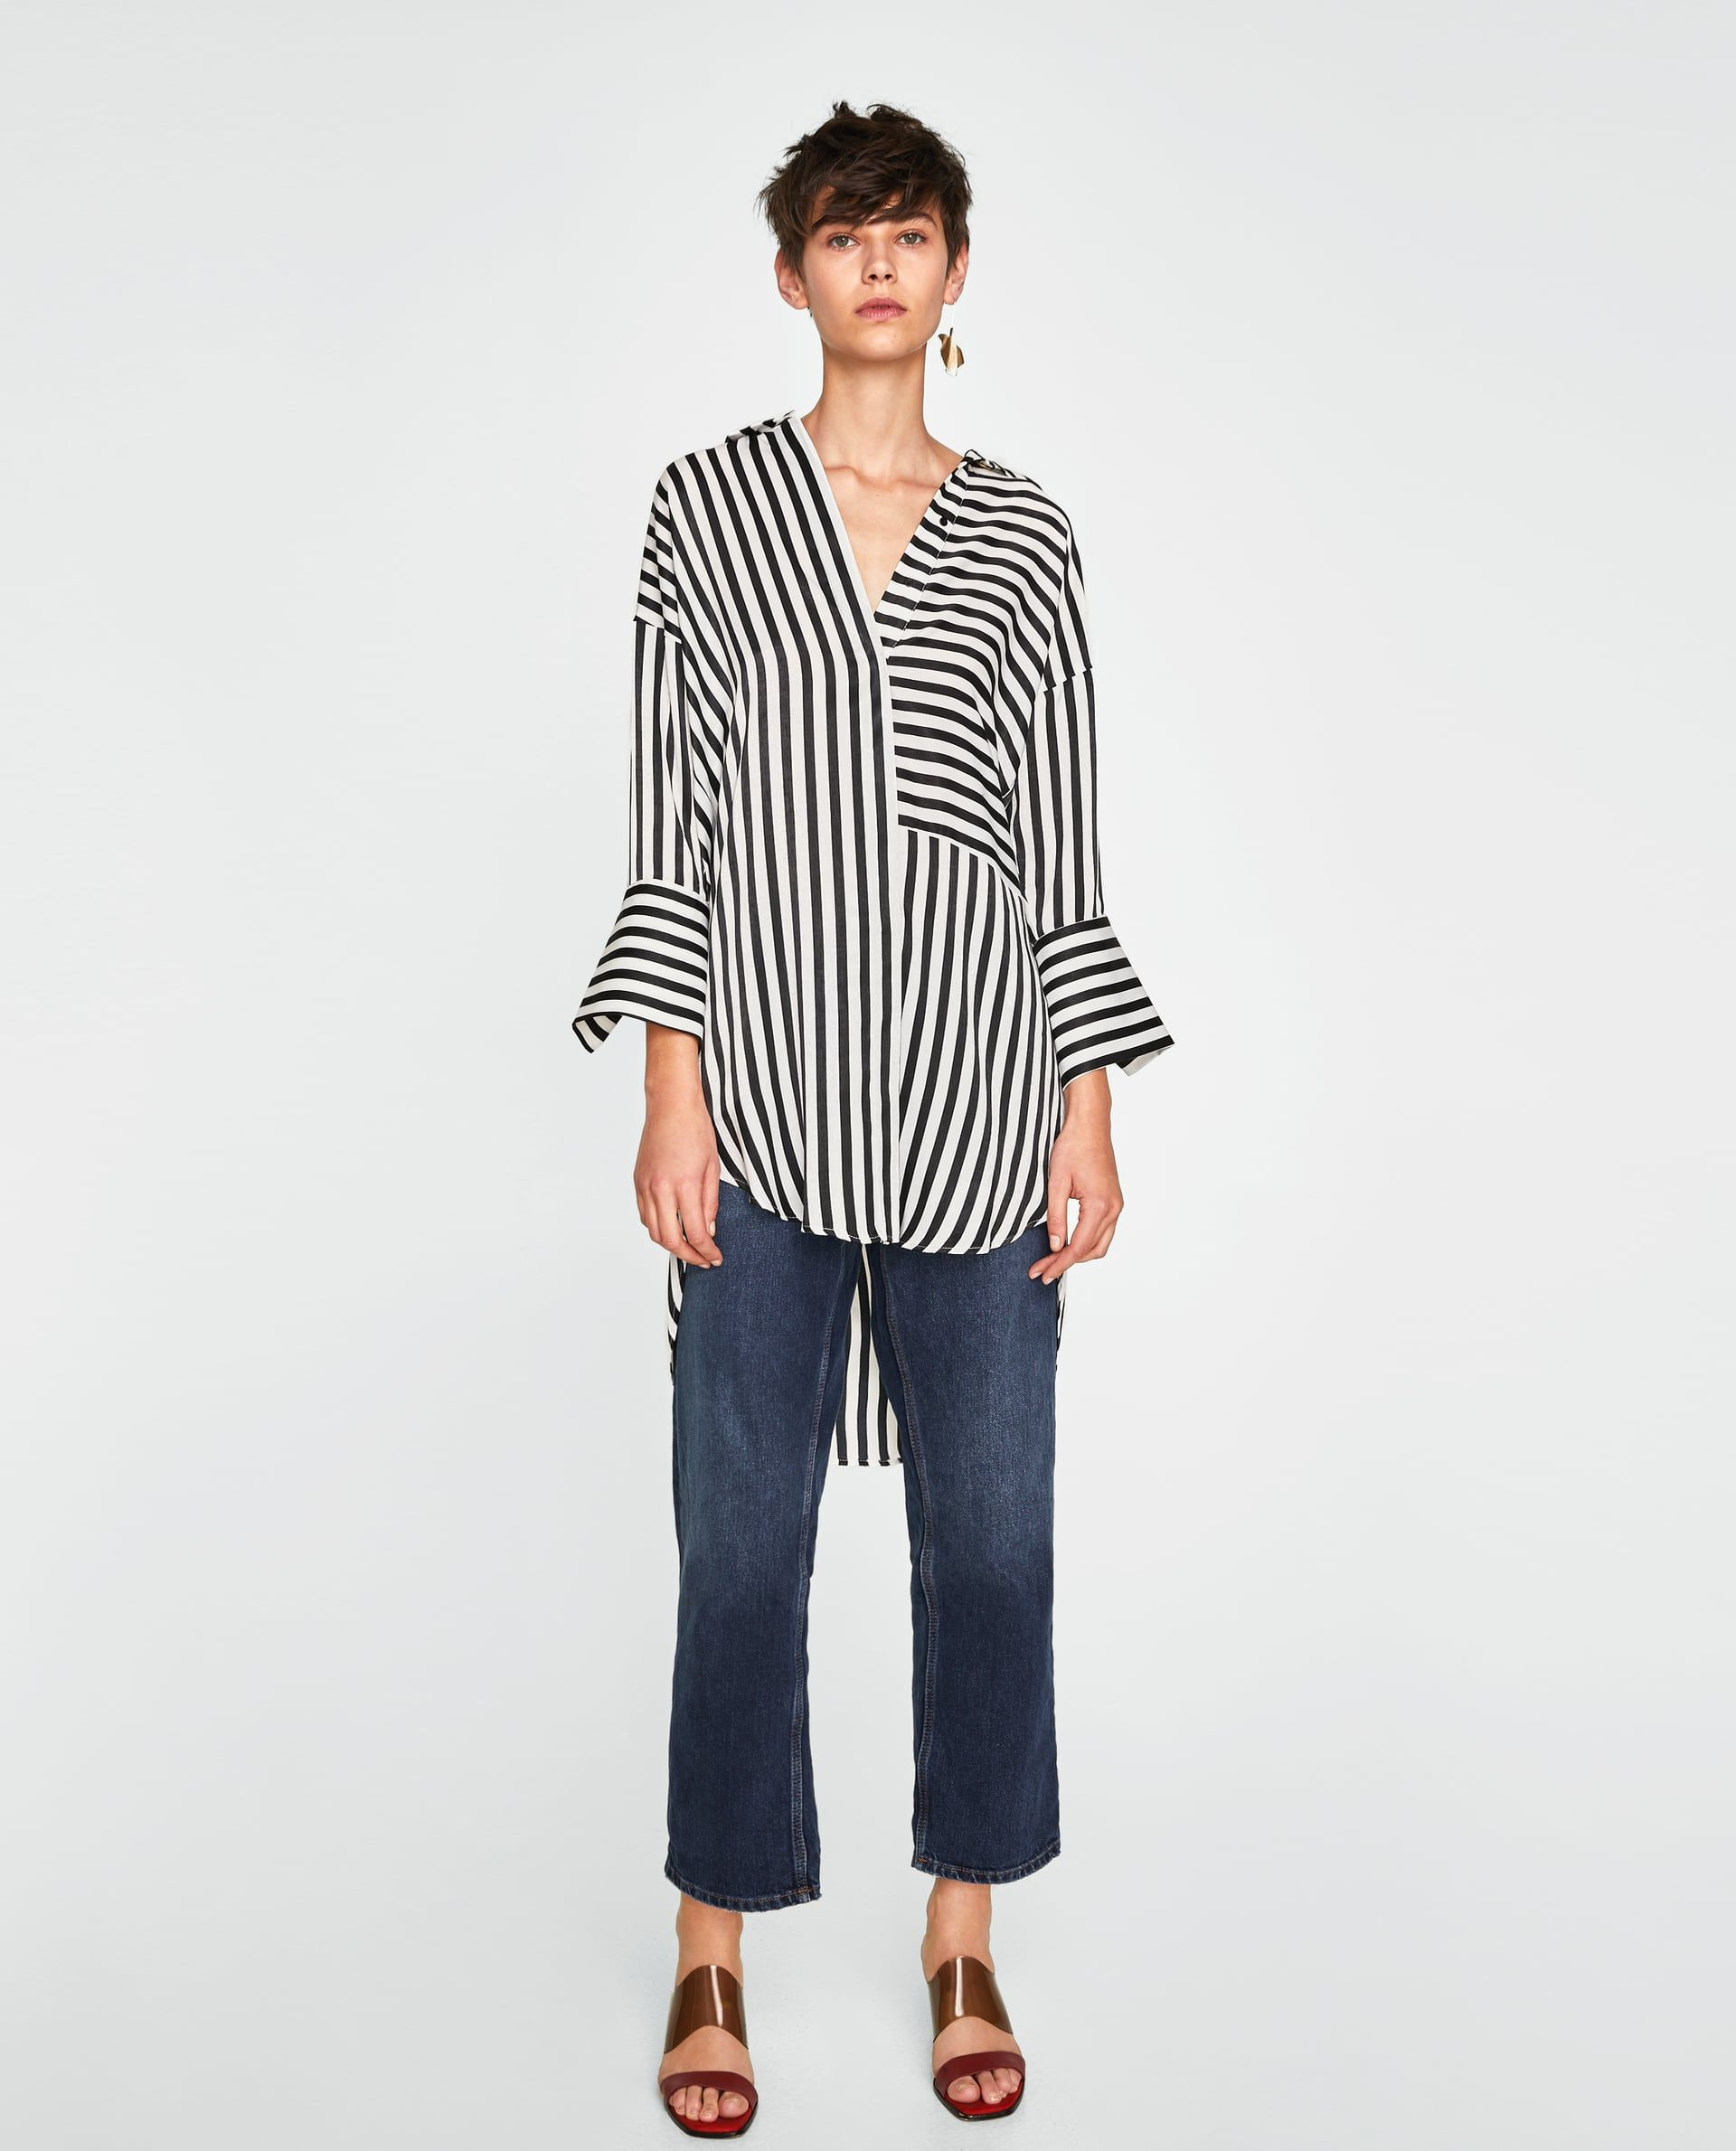 ZARA WOMAN STRIPED BLOUSE | Moda de otoño casual, Moda